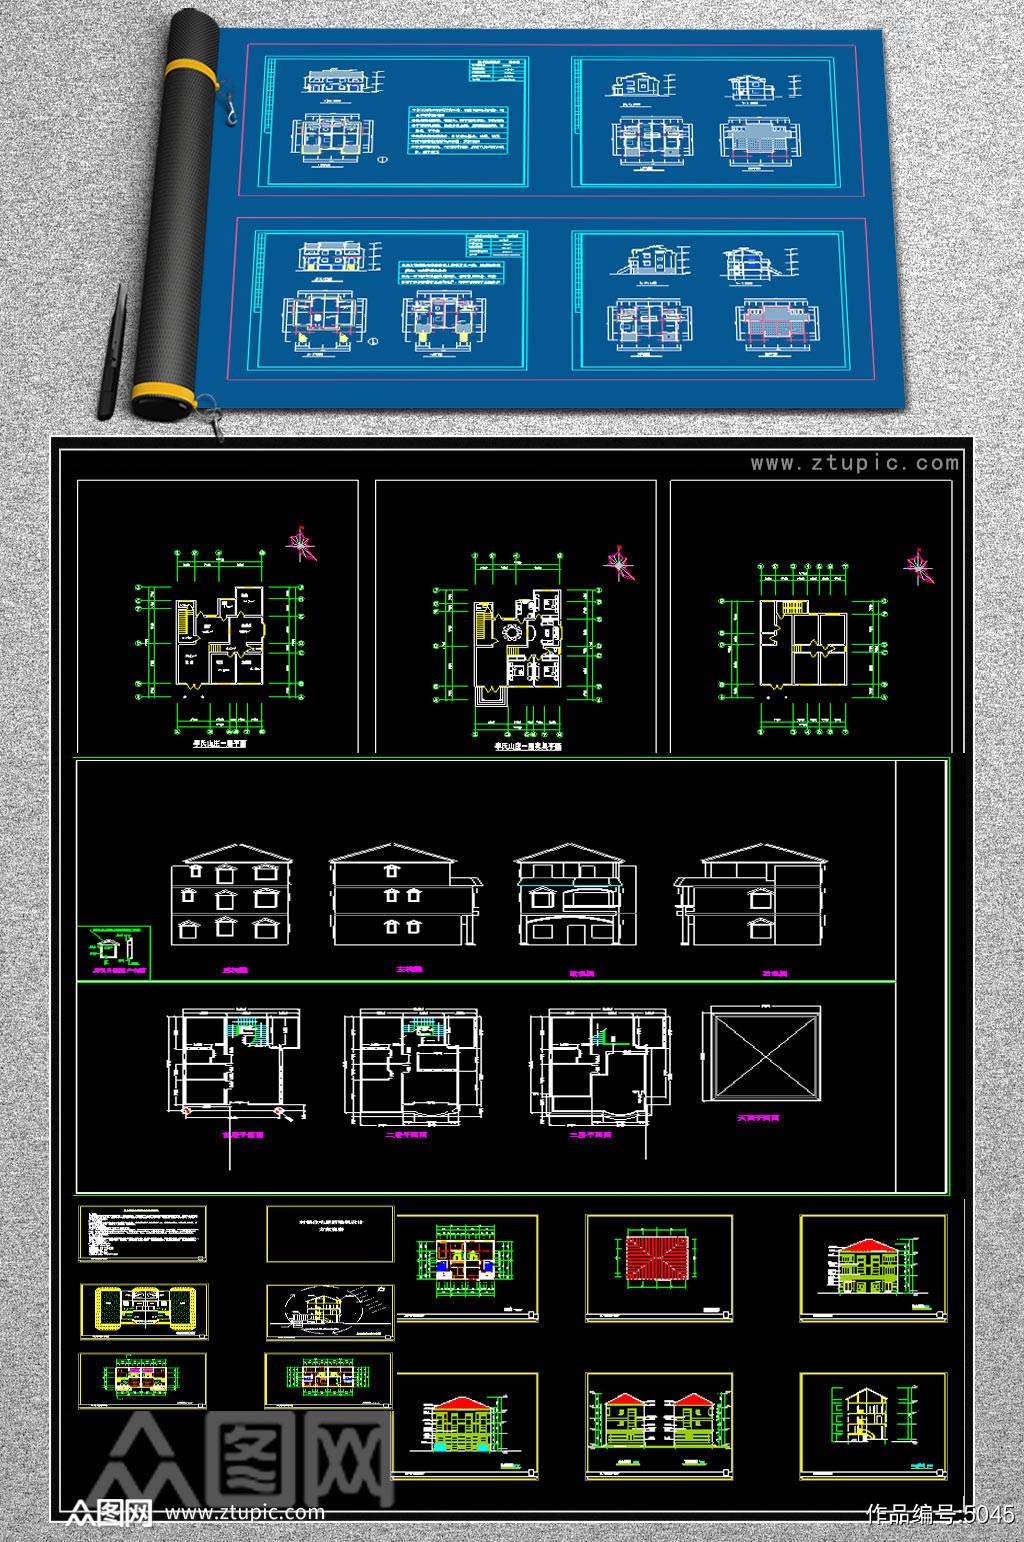 原创全套别墅CAD施工图素材